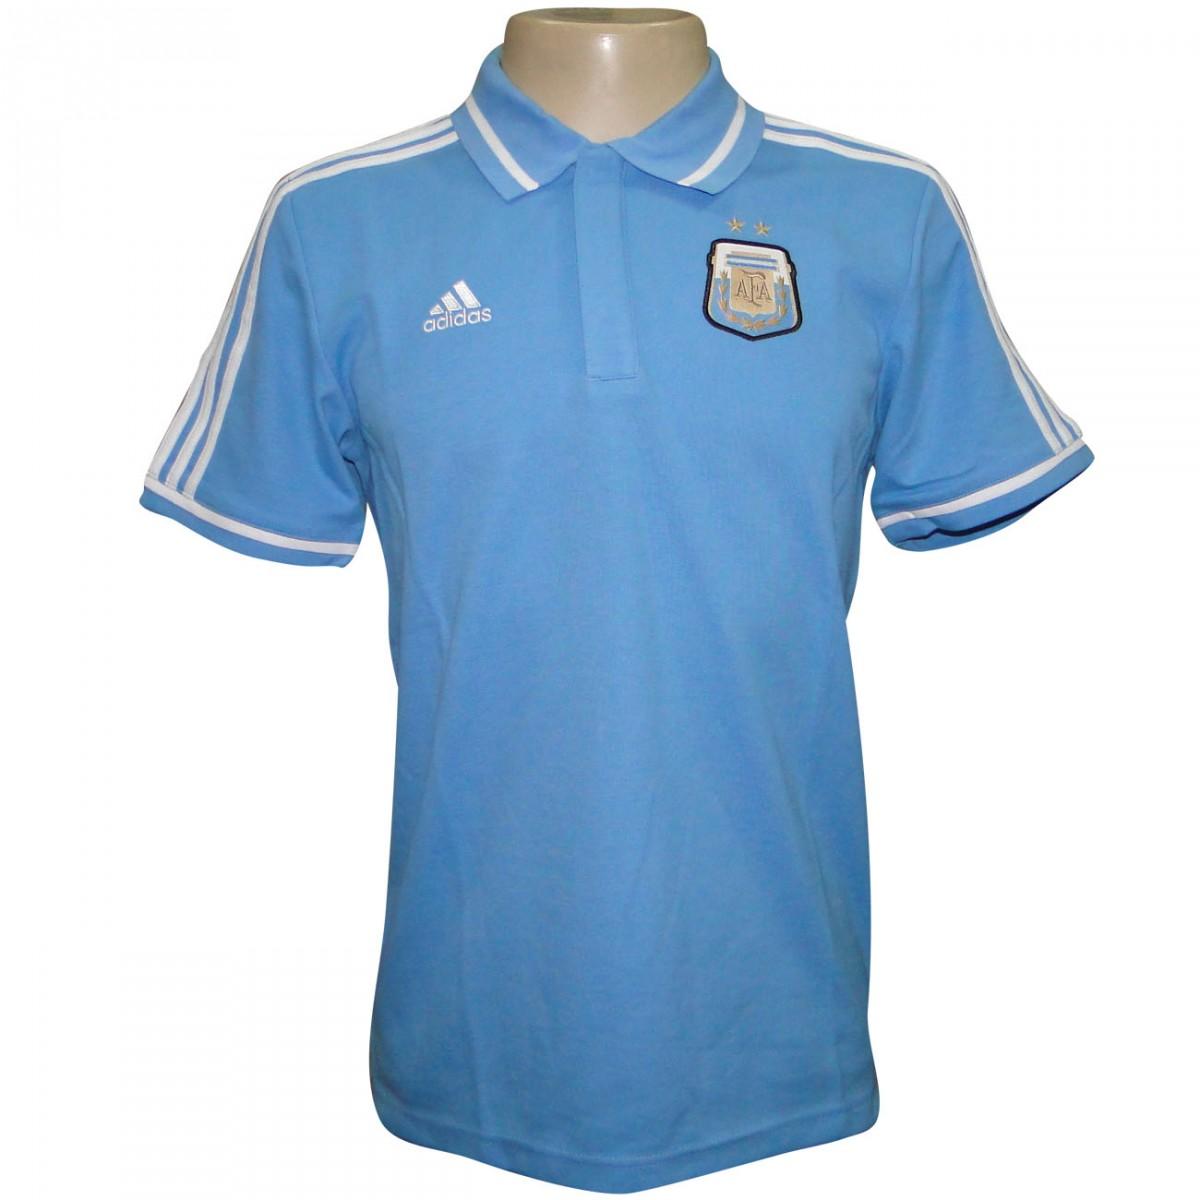 a56fd66fe883a Polo Adidas Argentina 2014 F89256 - Celeste Branco - Chuteira Nike ...